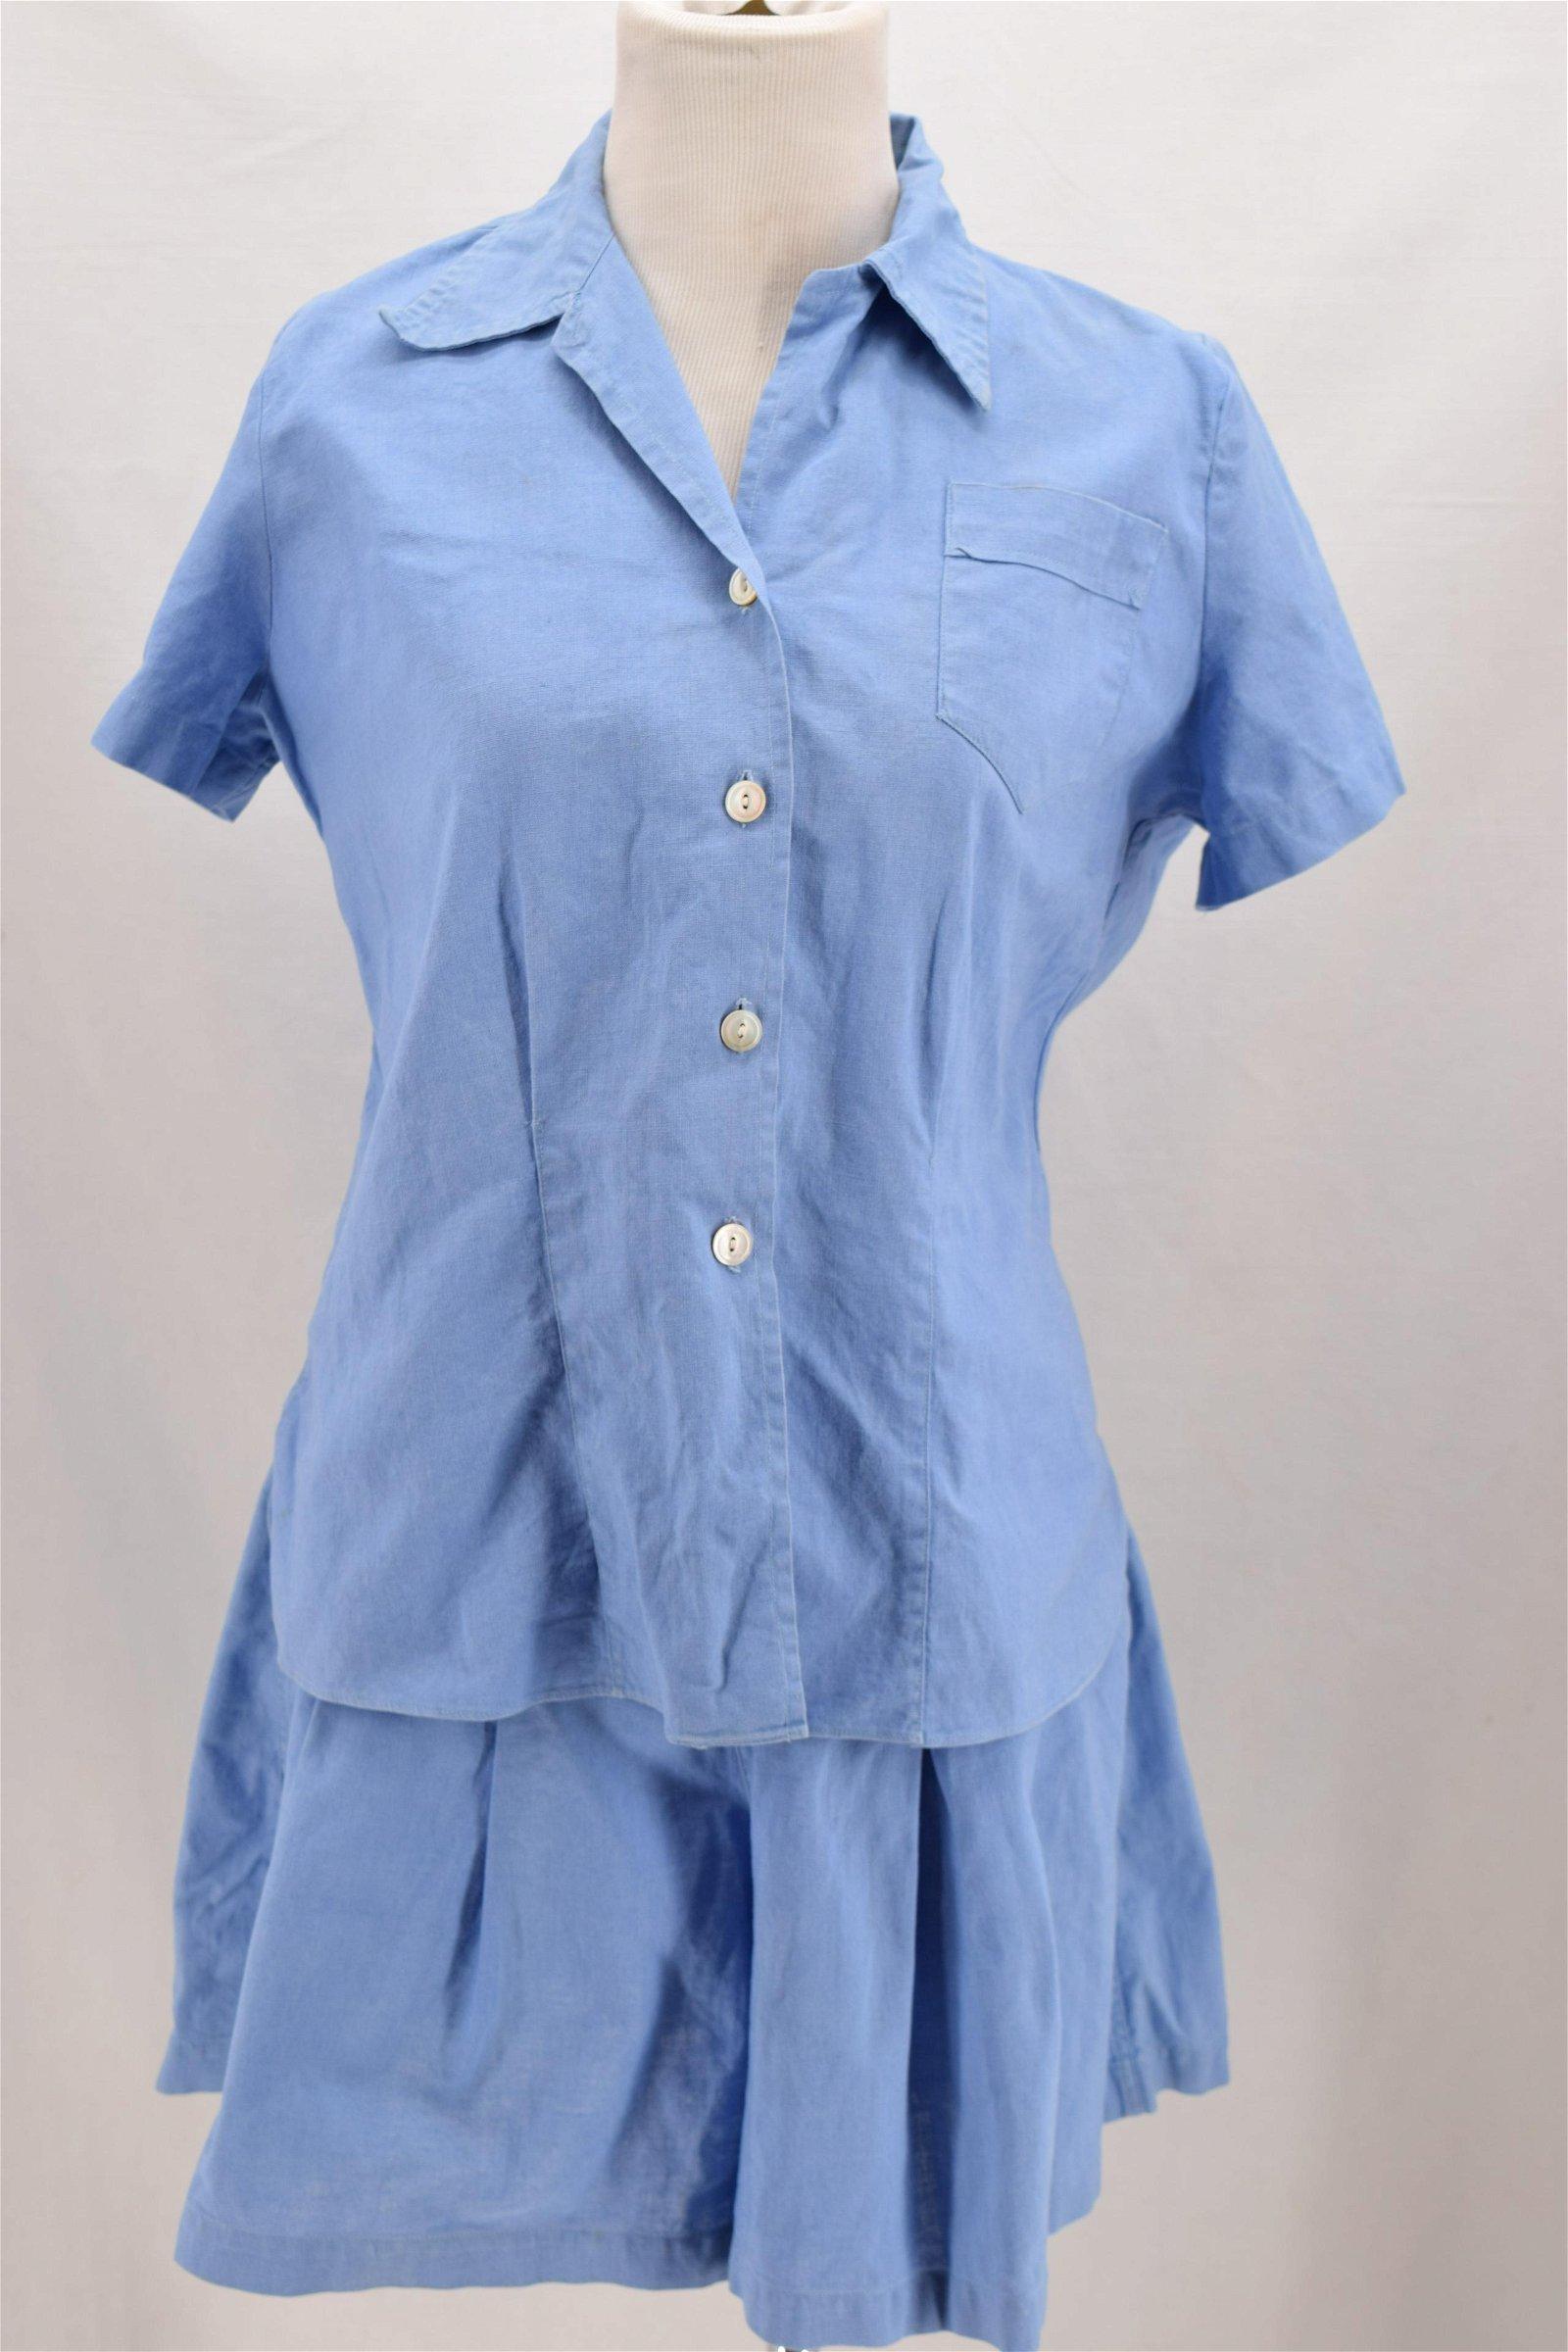 Vintage 1950's WRIGHT DITSON, Gym Uniform, 2 piece